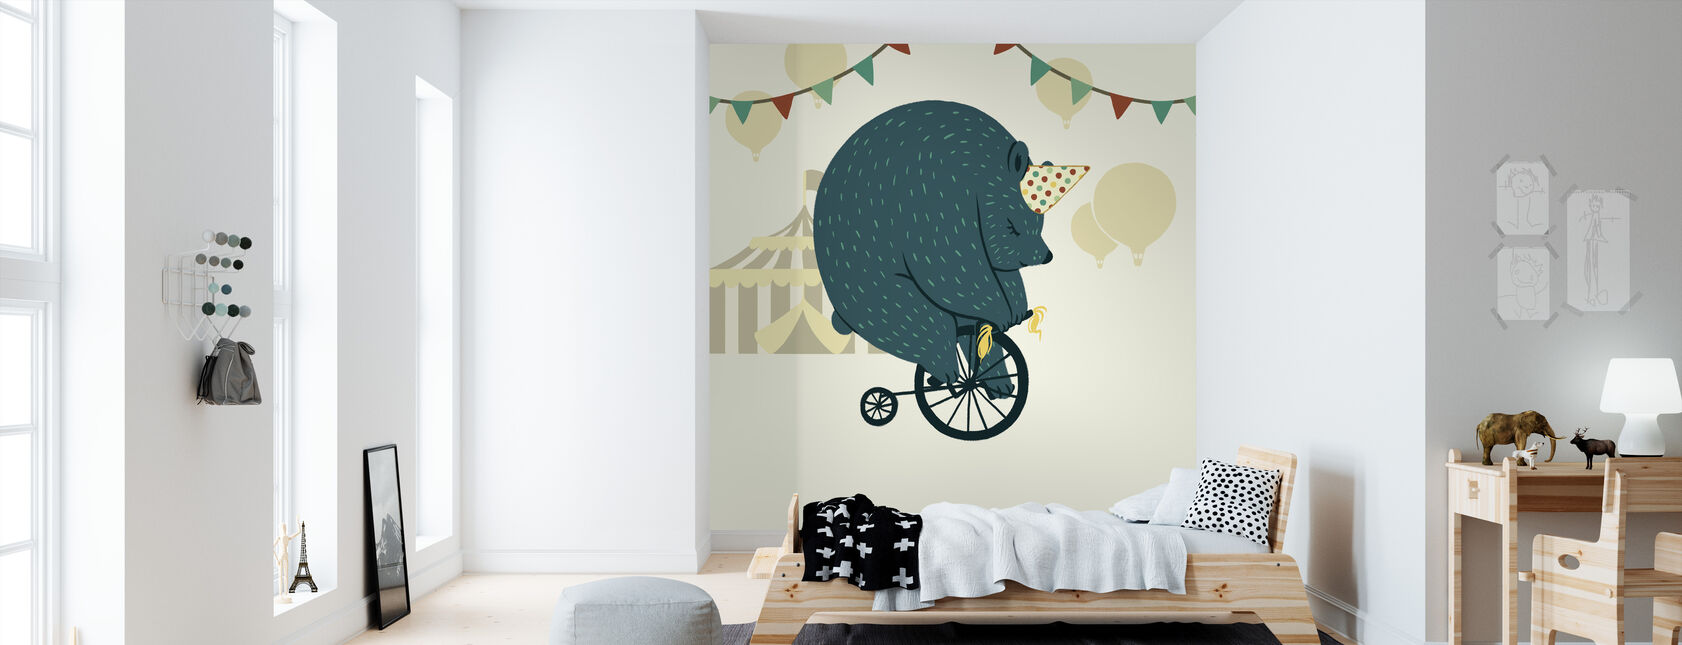 Pikku sirkuskarhu - Tapetti - Lastenhuone